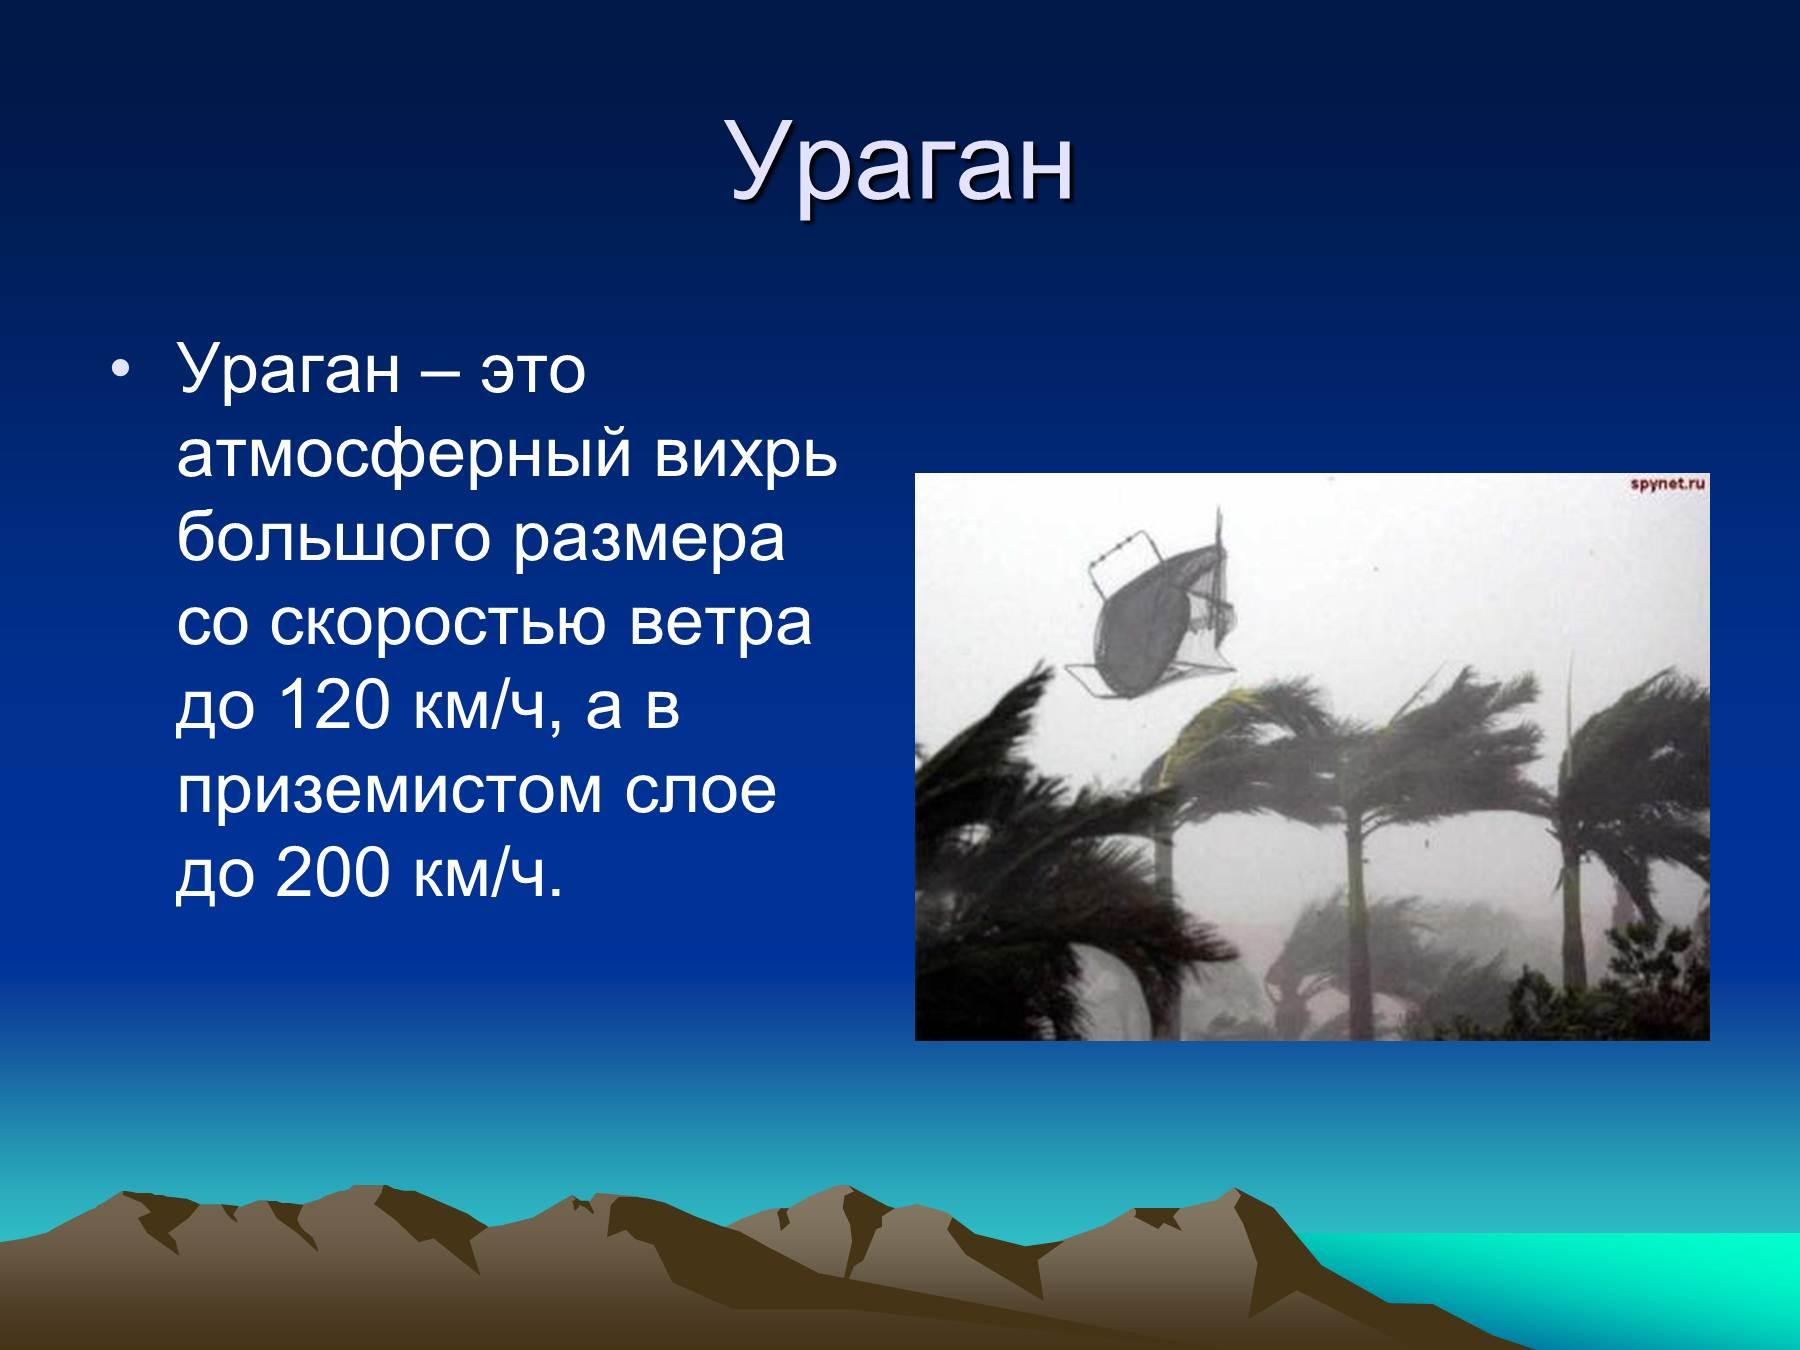 Ураганы картинки для презентации